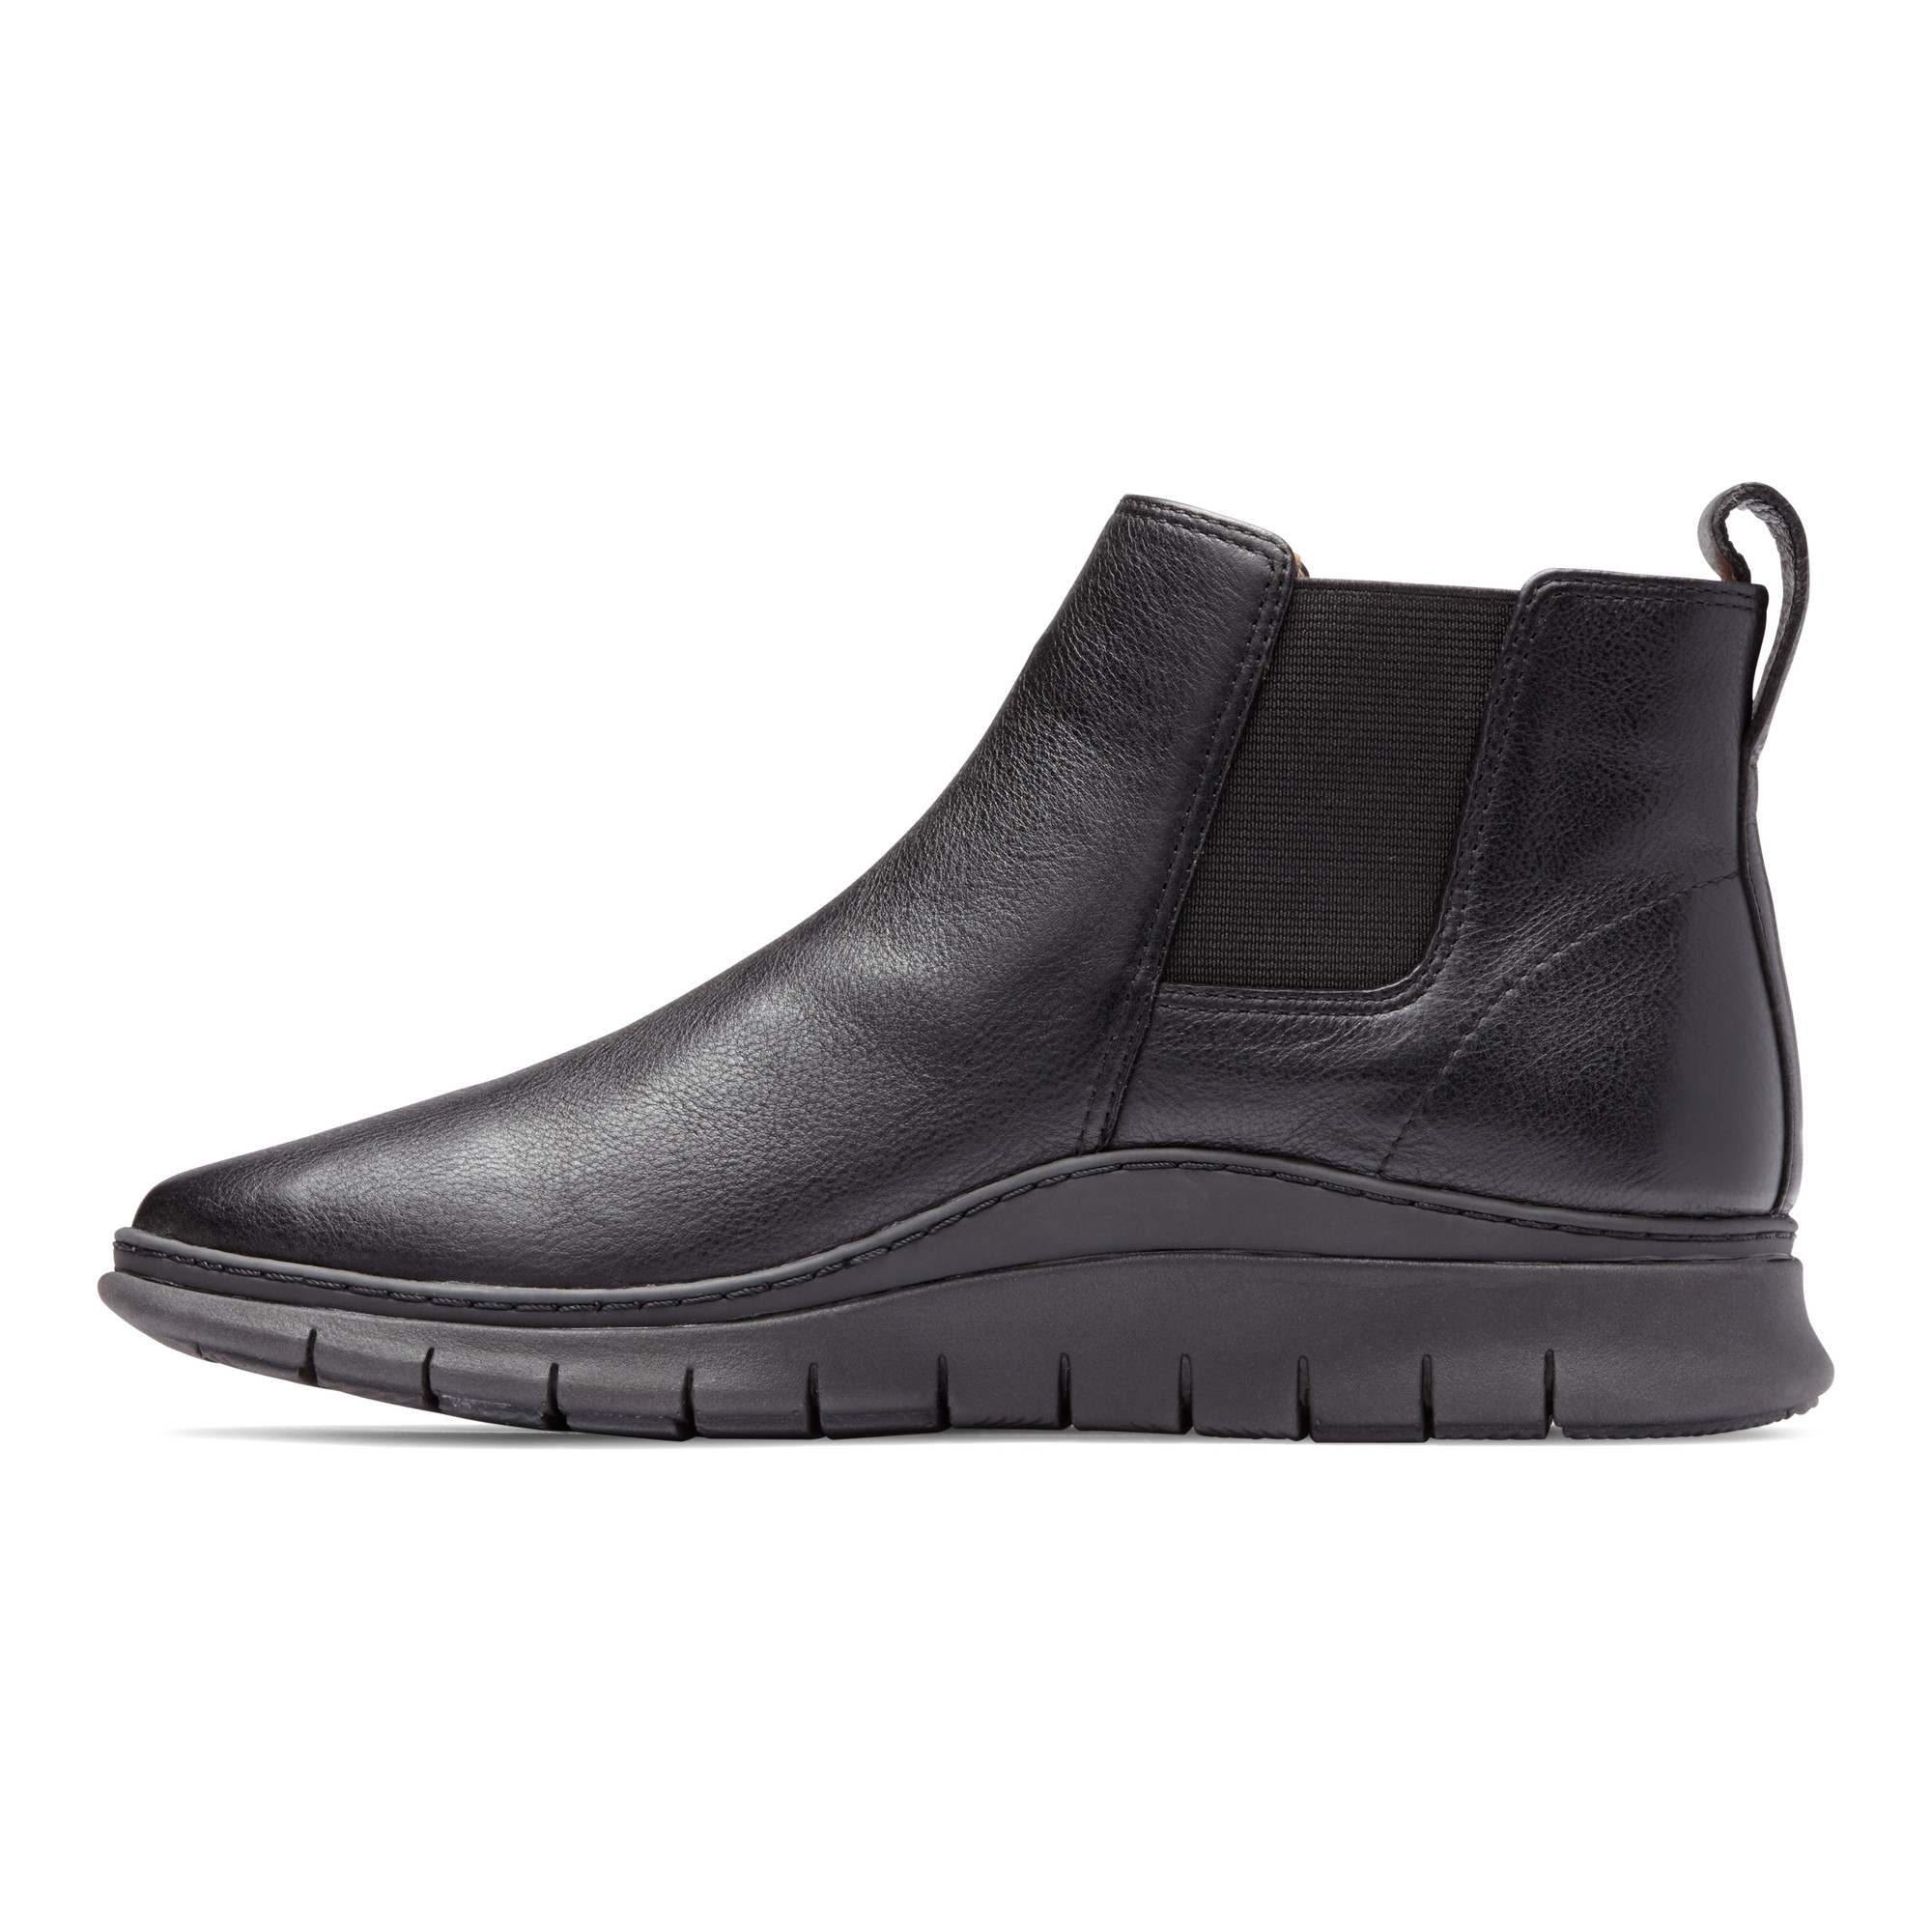 Vionic Women's Kaufman Casual Sneaker